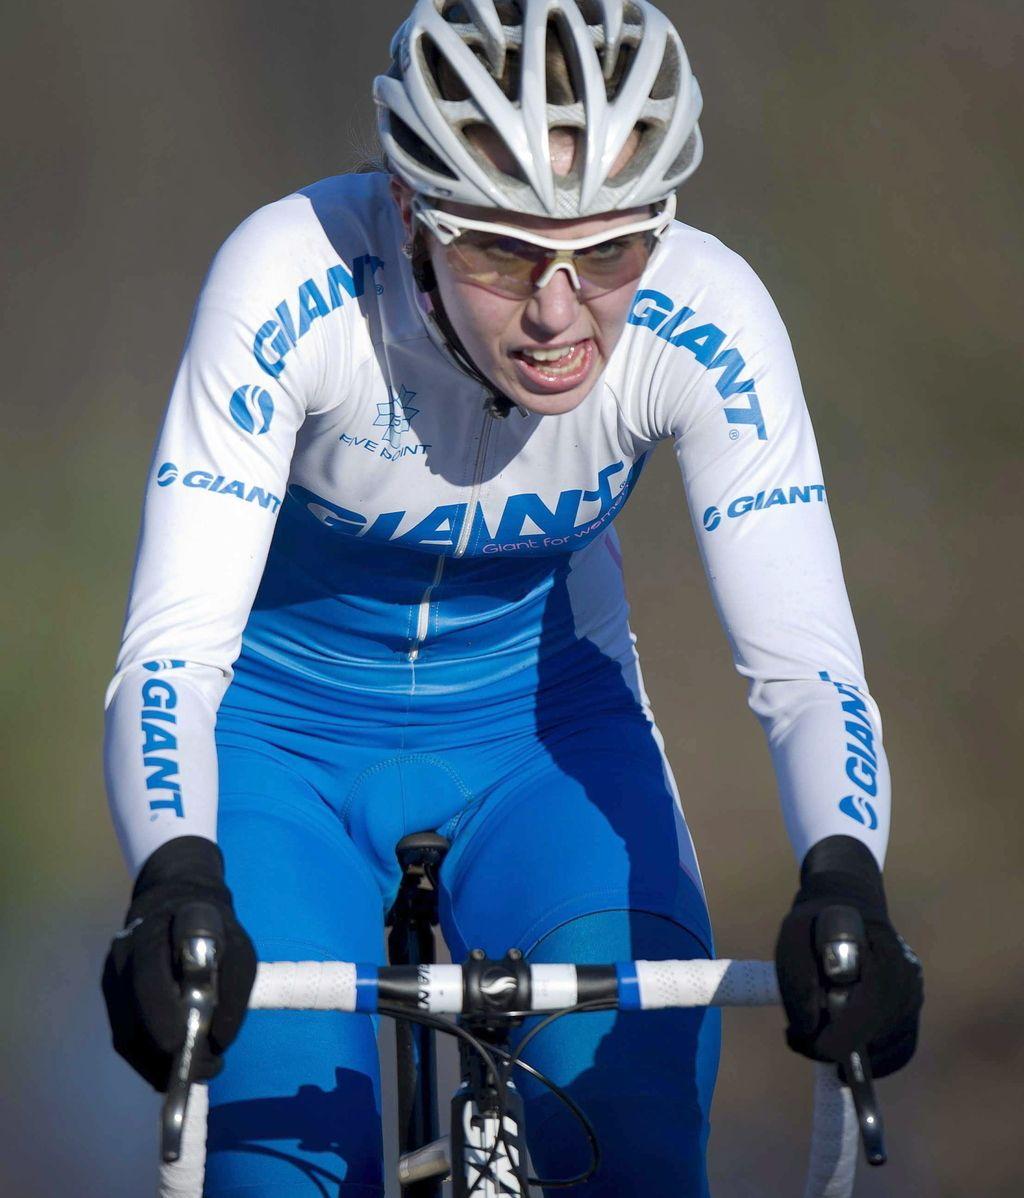 Muere la ciclista Annefleur Kalvenhaar